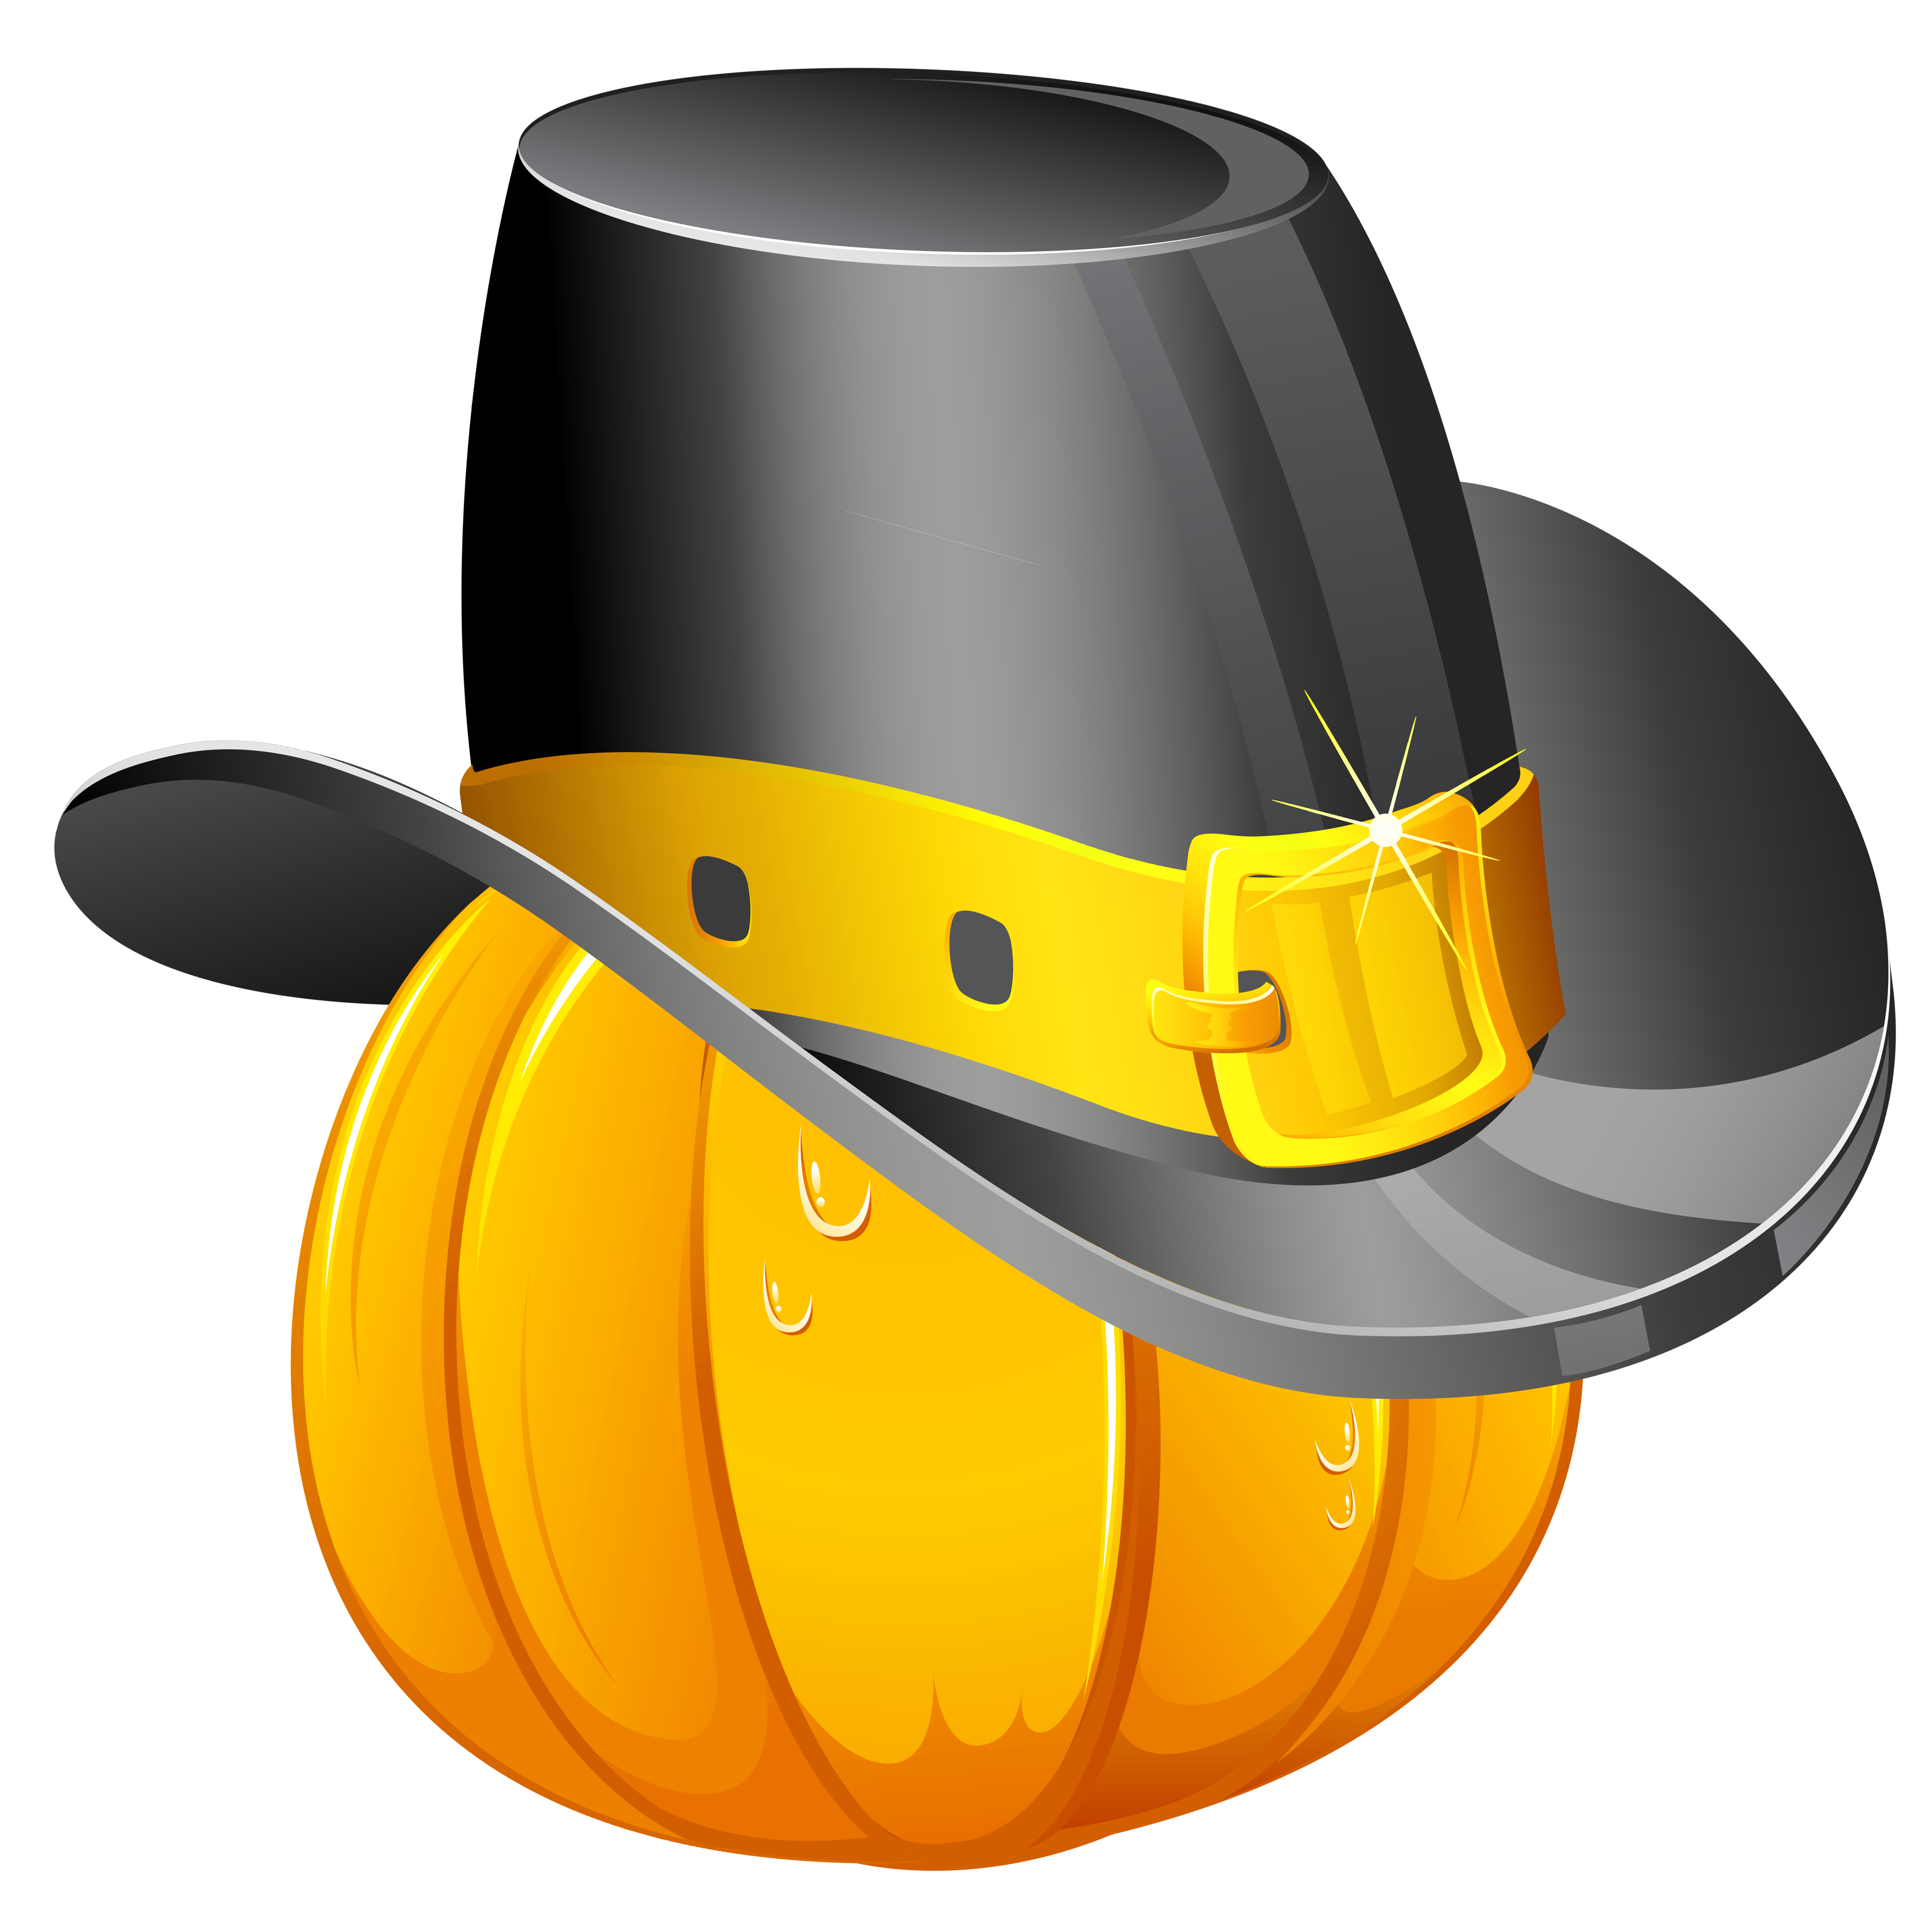 3827x3786 Thanksgiving Pumpkin With Pilgrim Hat Png Clipartu200b Gallery